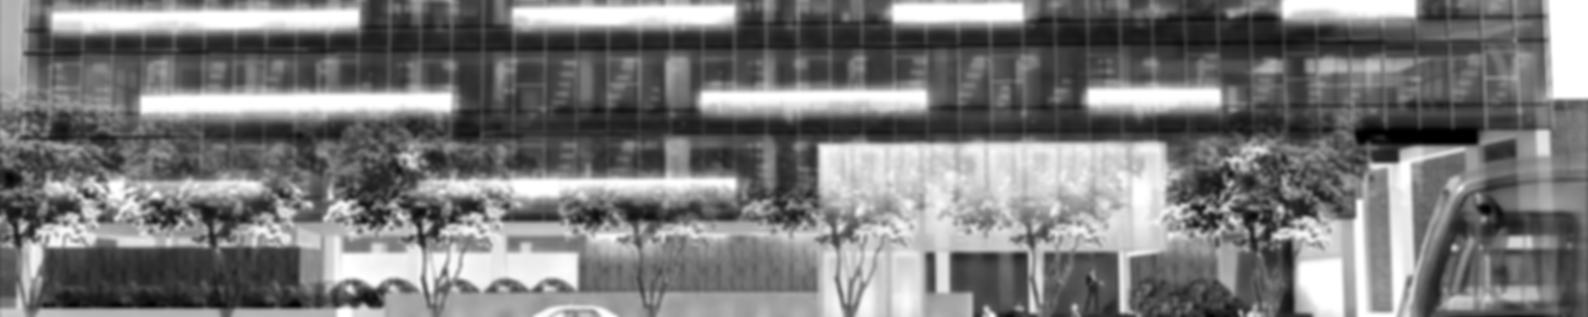 C002-EV-IMG-021-1_edited_edited.png